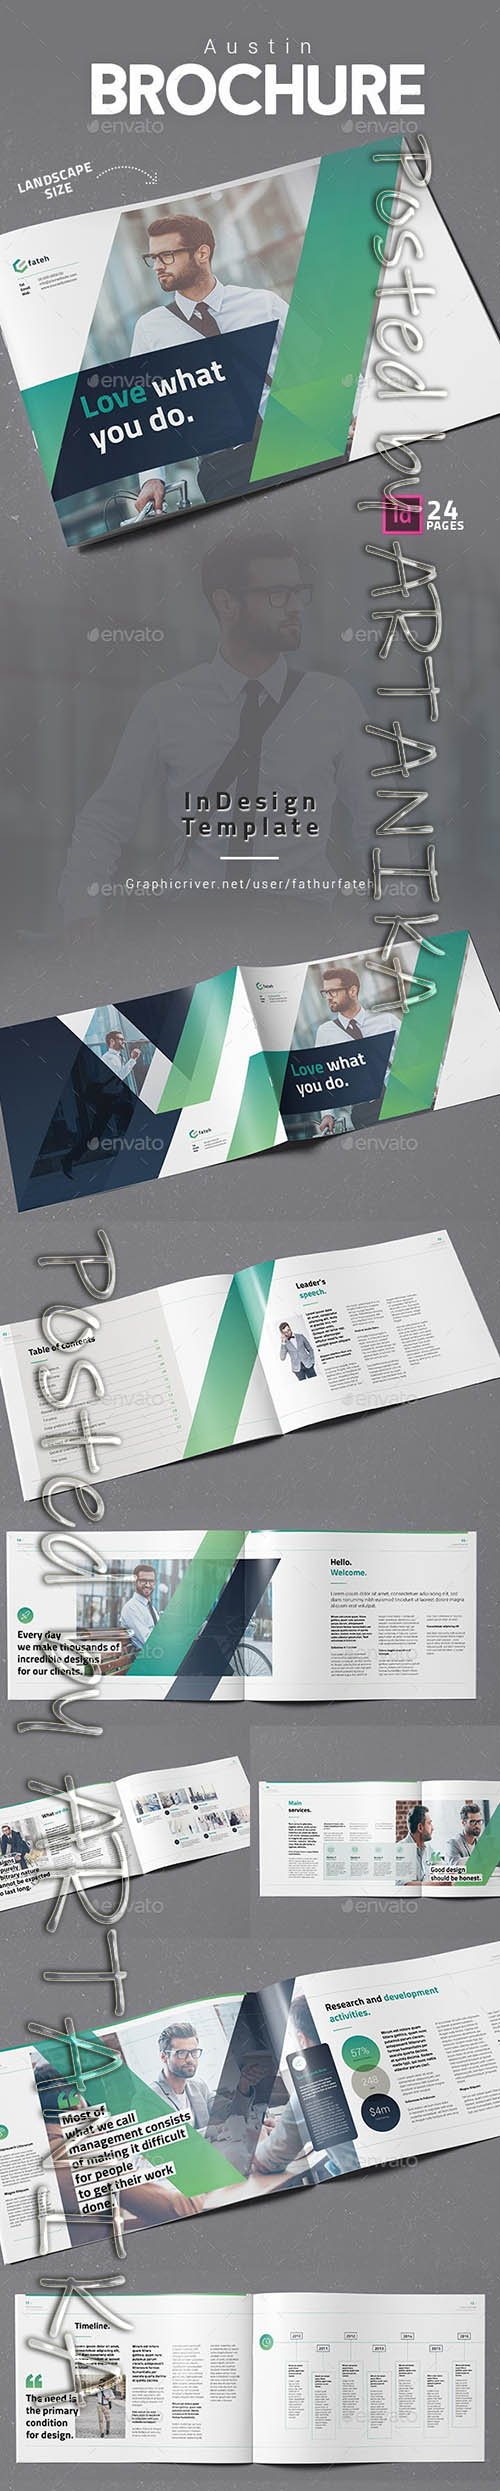 Austin Brochure 21131398